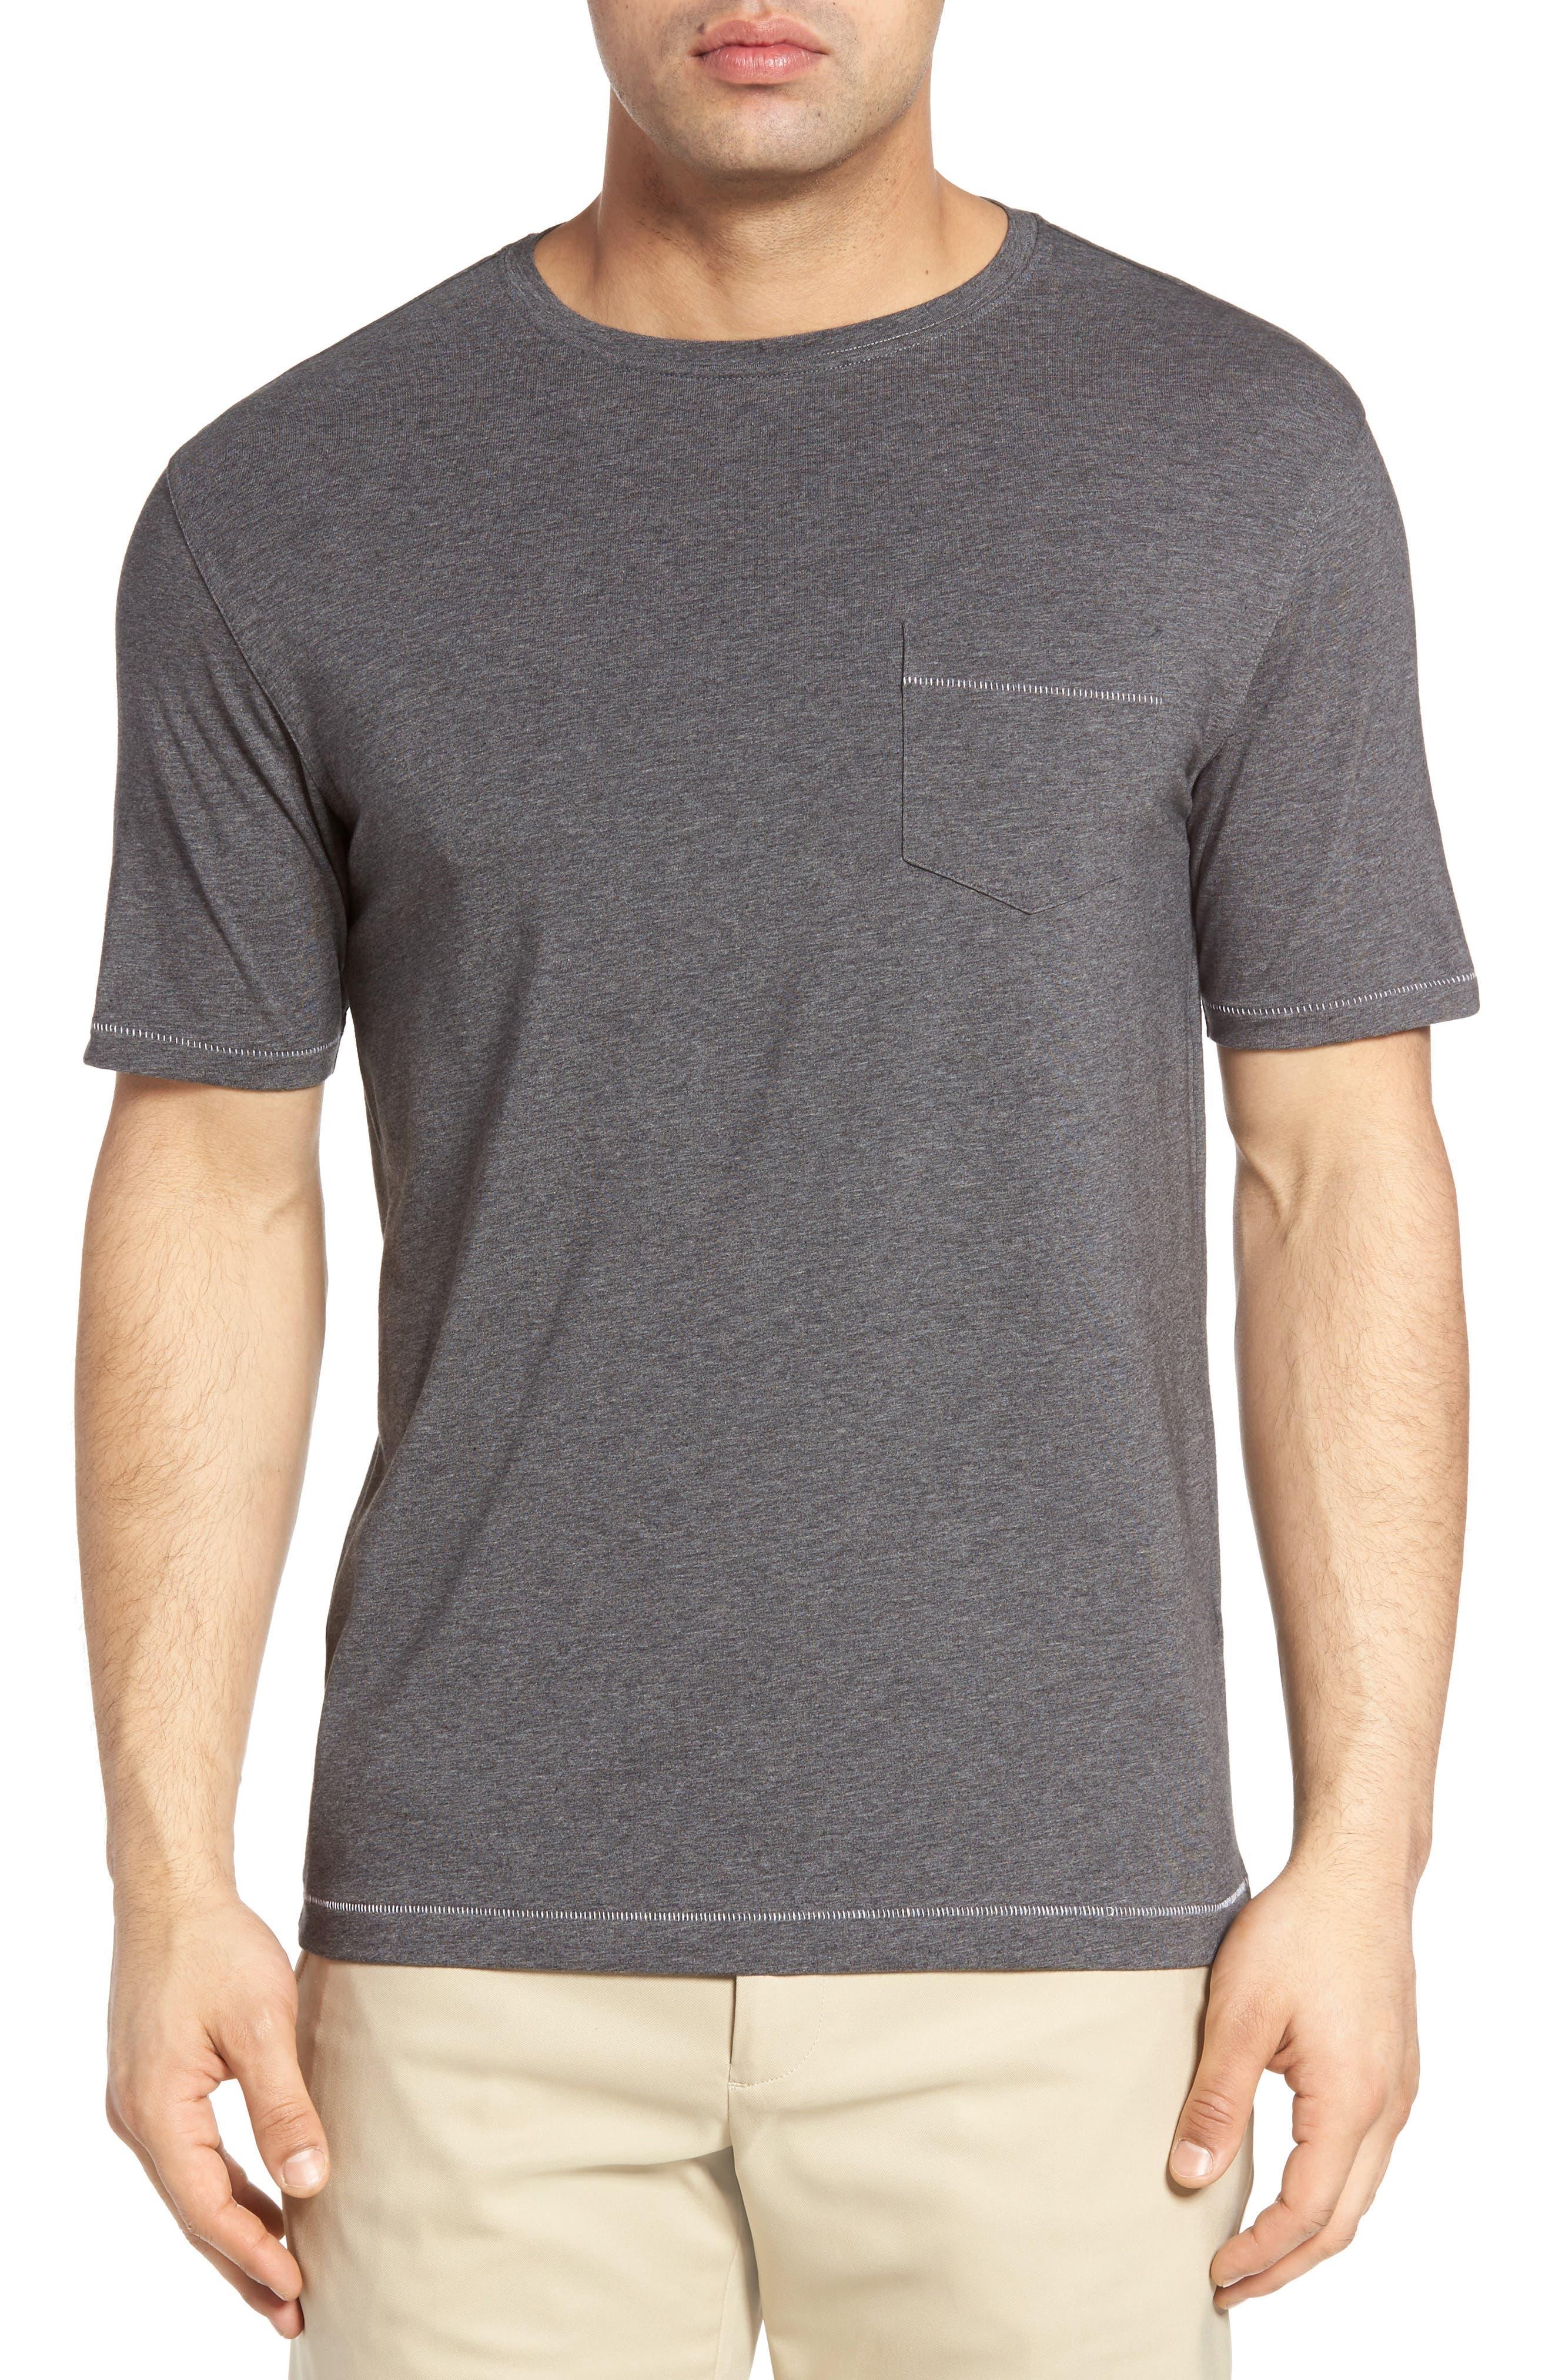 BOBBY JONES R18 Pocket T-Shirt, Main, color, 011